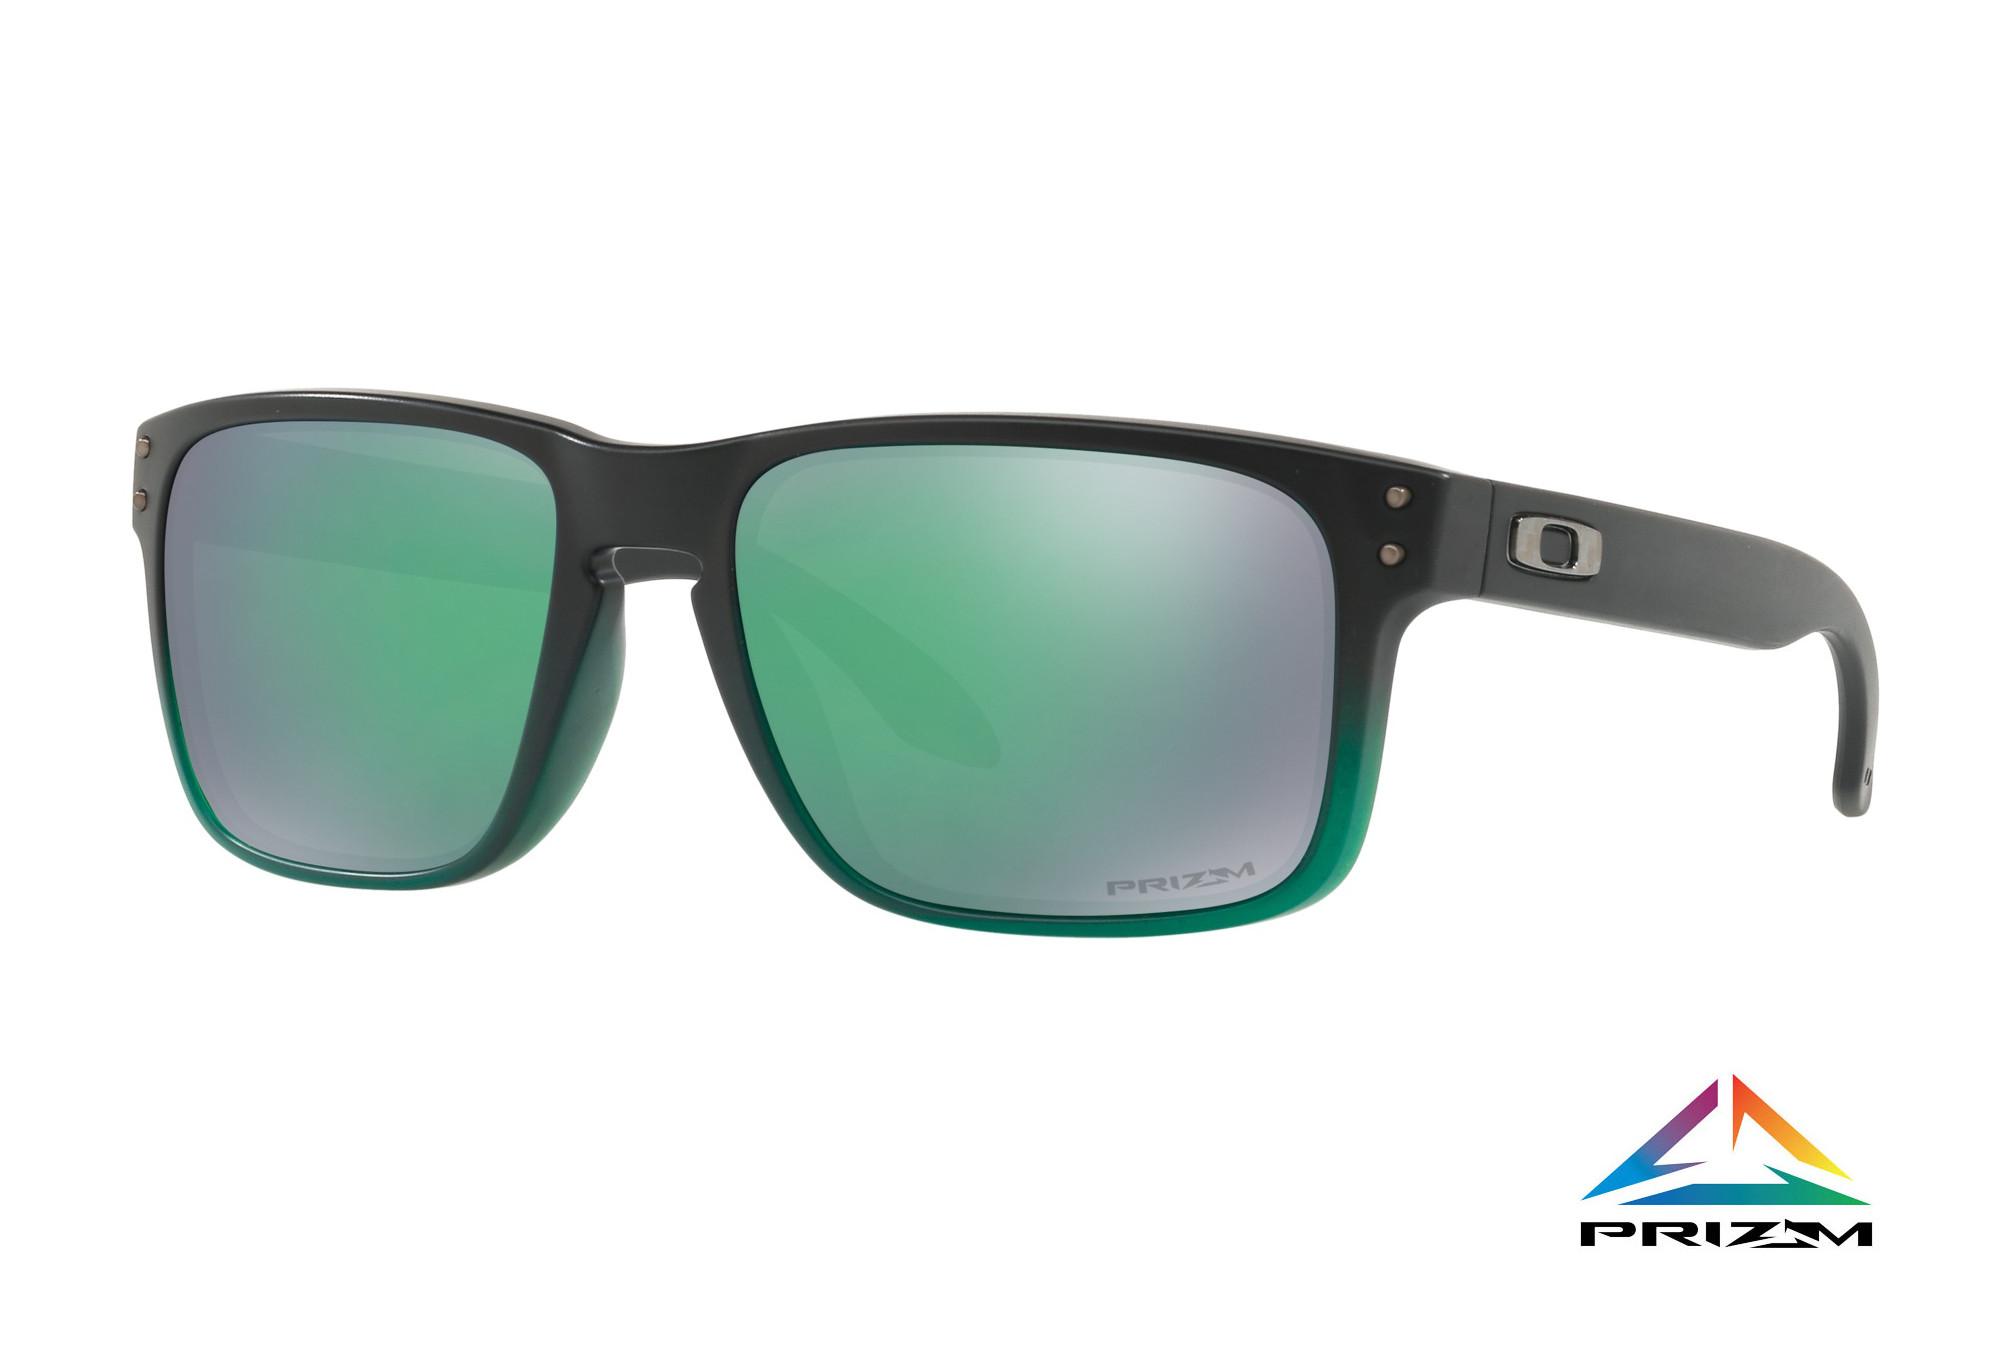 c27928959a6 Oakley Holbrook Sunglasses Black Green - Prizm Jade Ref OO9102-E455 ...